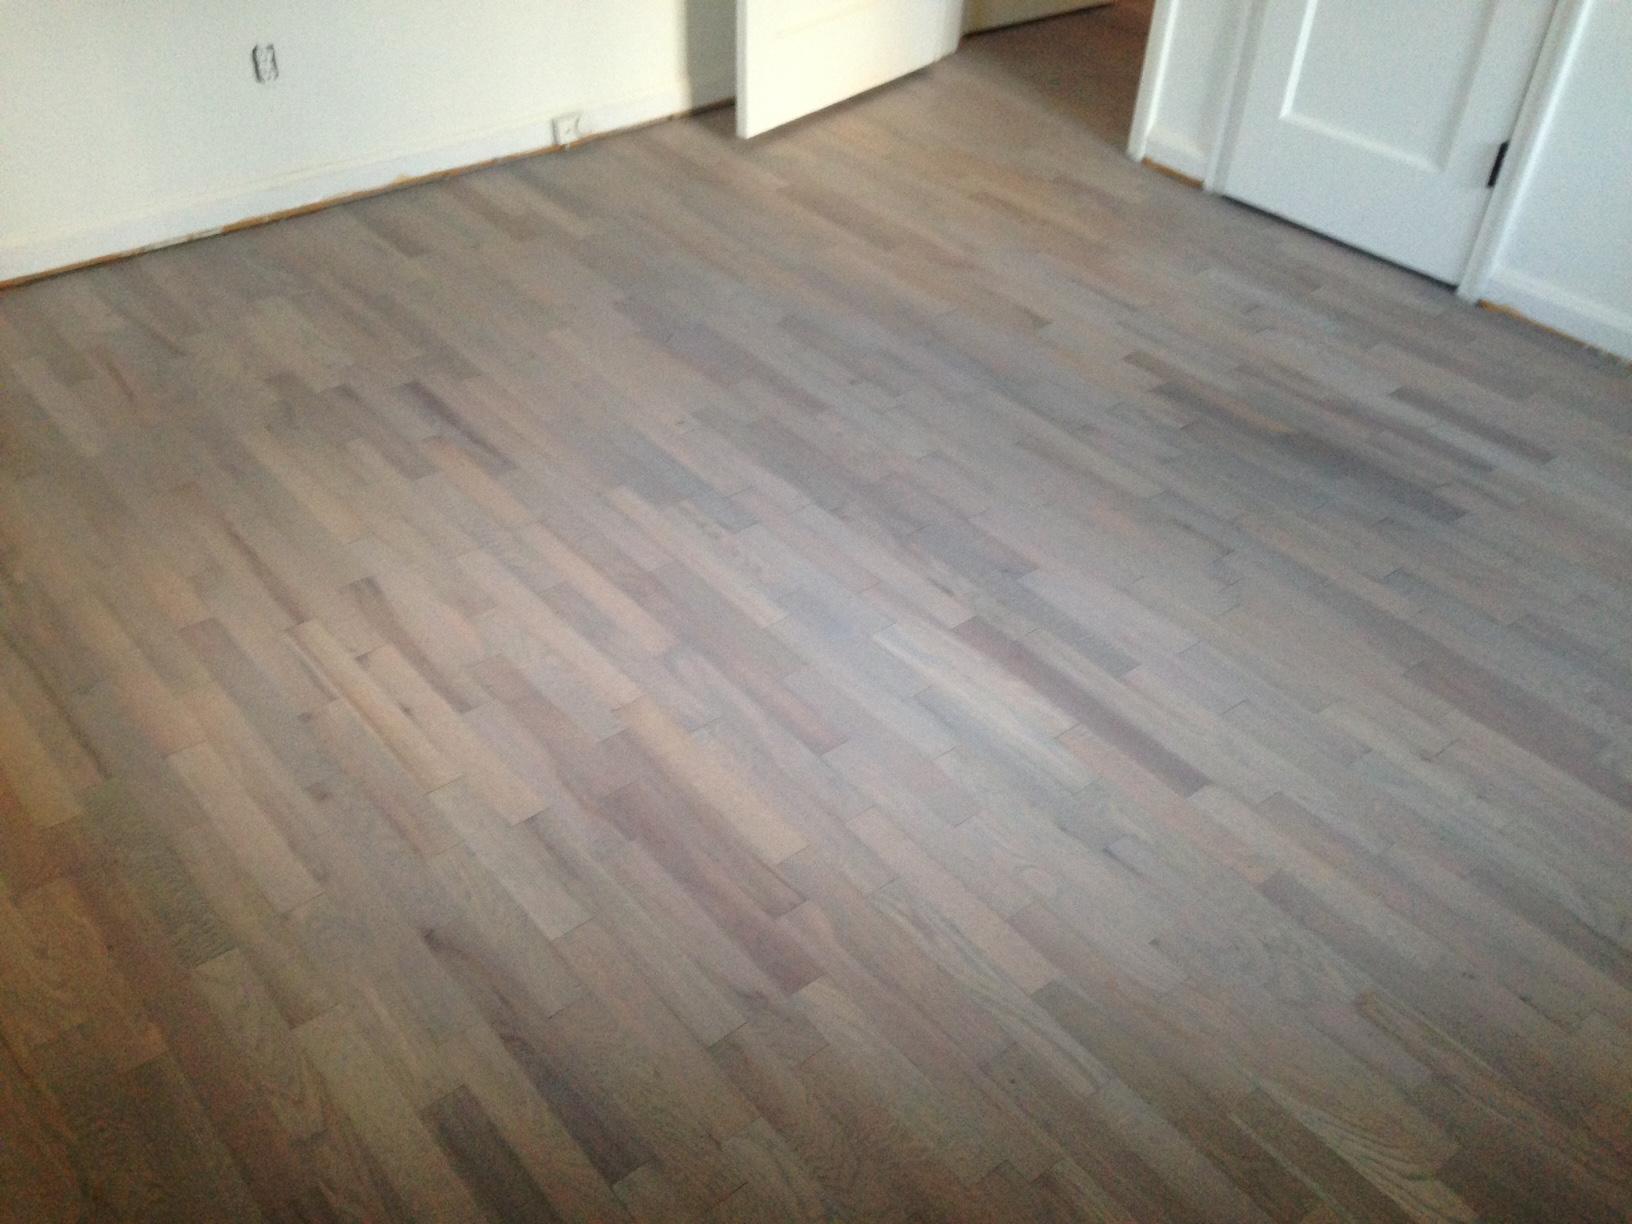 Refinishing Wood Floors for a Beach House Look  Dans